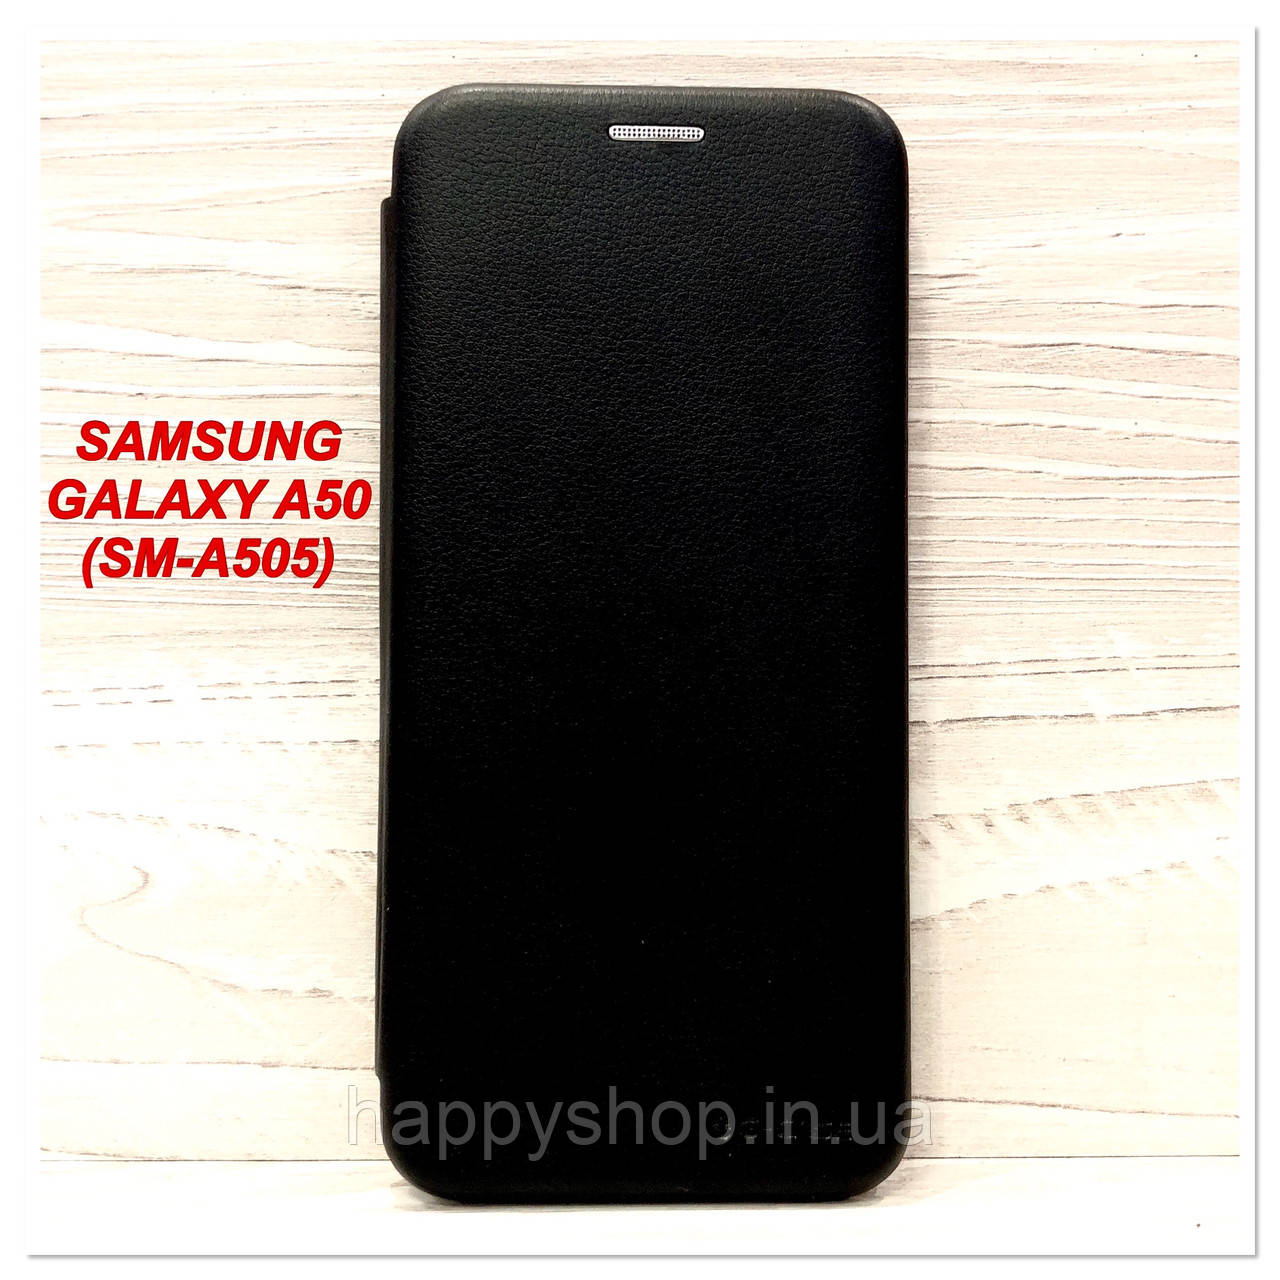 Чохол-книжка G-Case для Samsung Galaxy A50 (SM-A505) Чорний